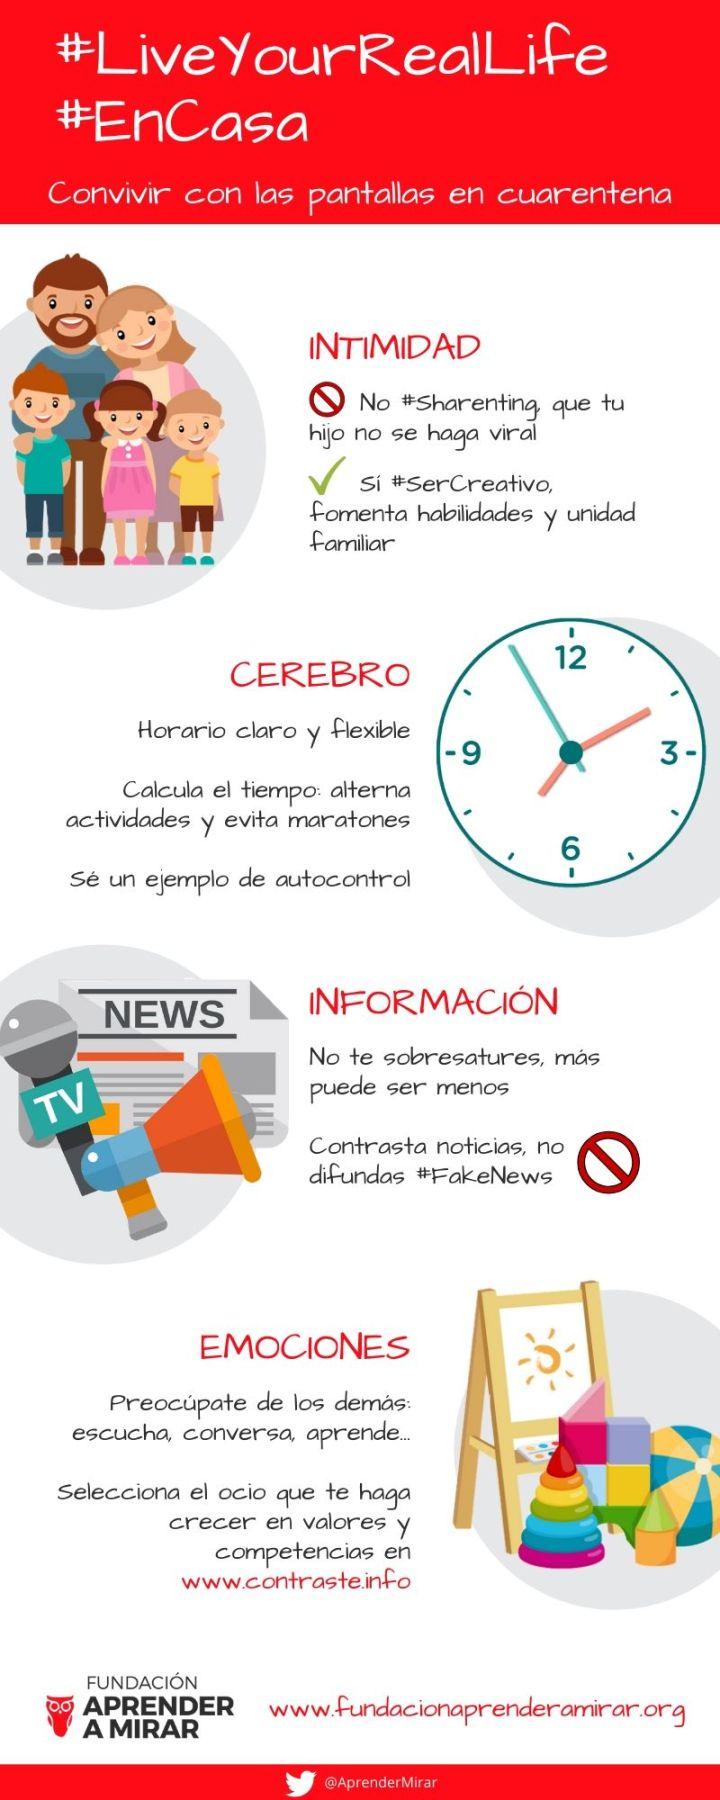 Pantallas en Cuarentena Fundación Aprender a Mirar